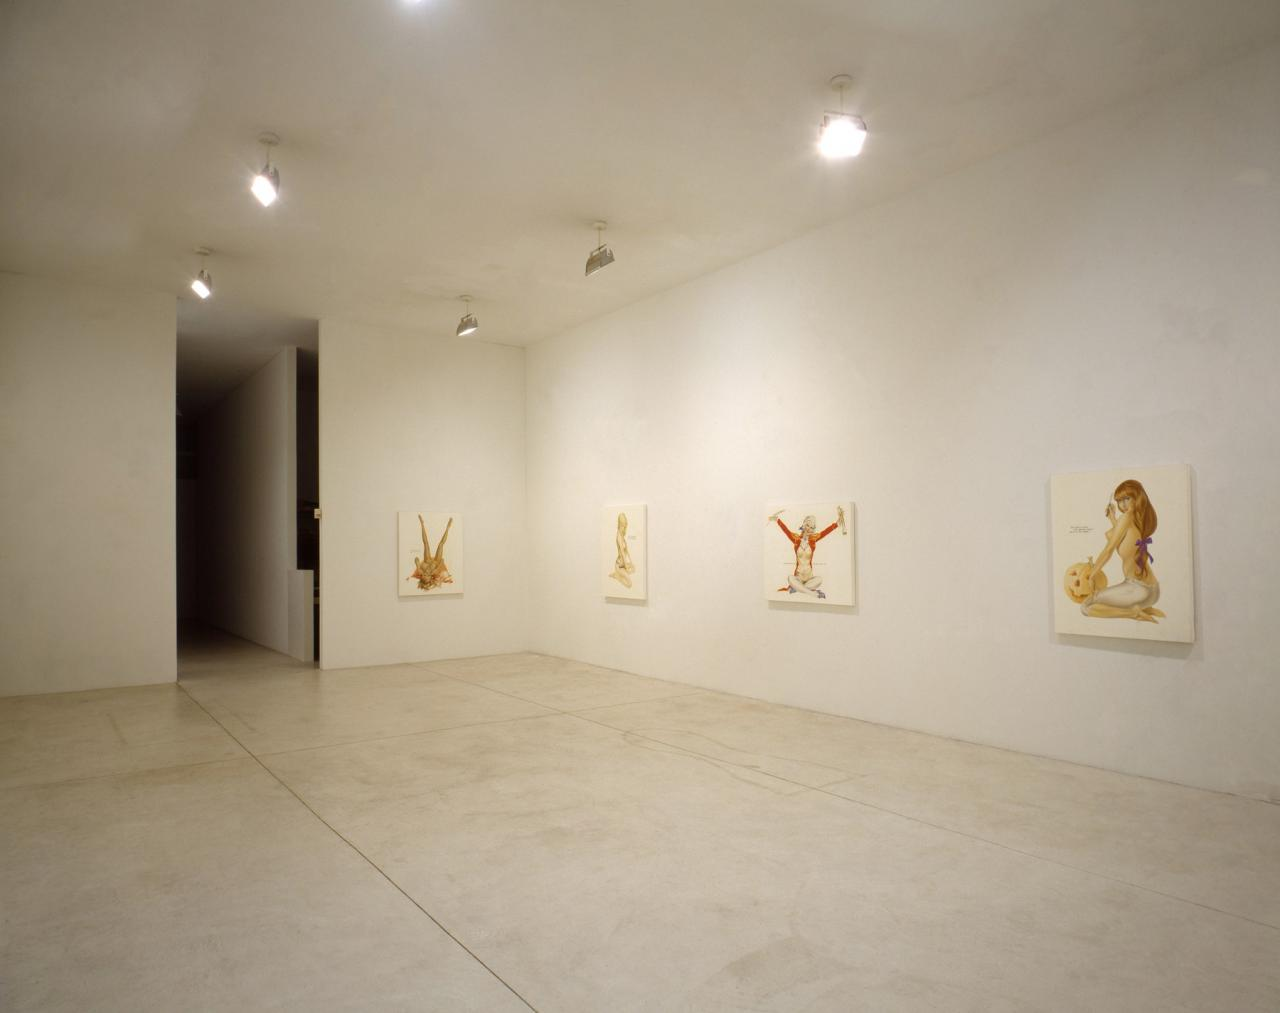 Installation view Playboys Pat Hearn Gallery, New York 1993 Photo: Tom Warren